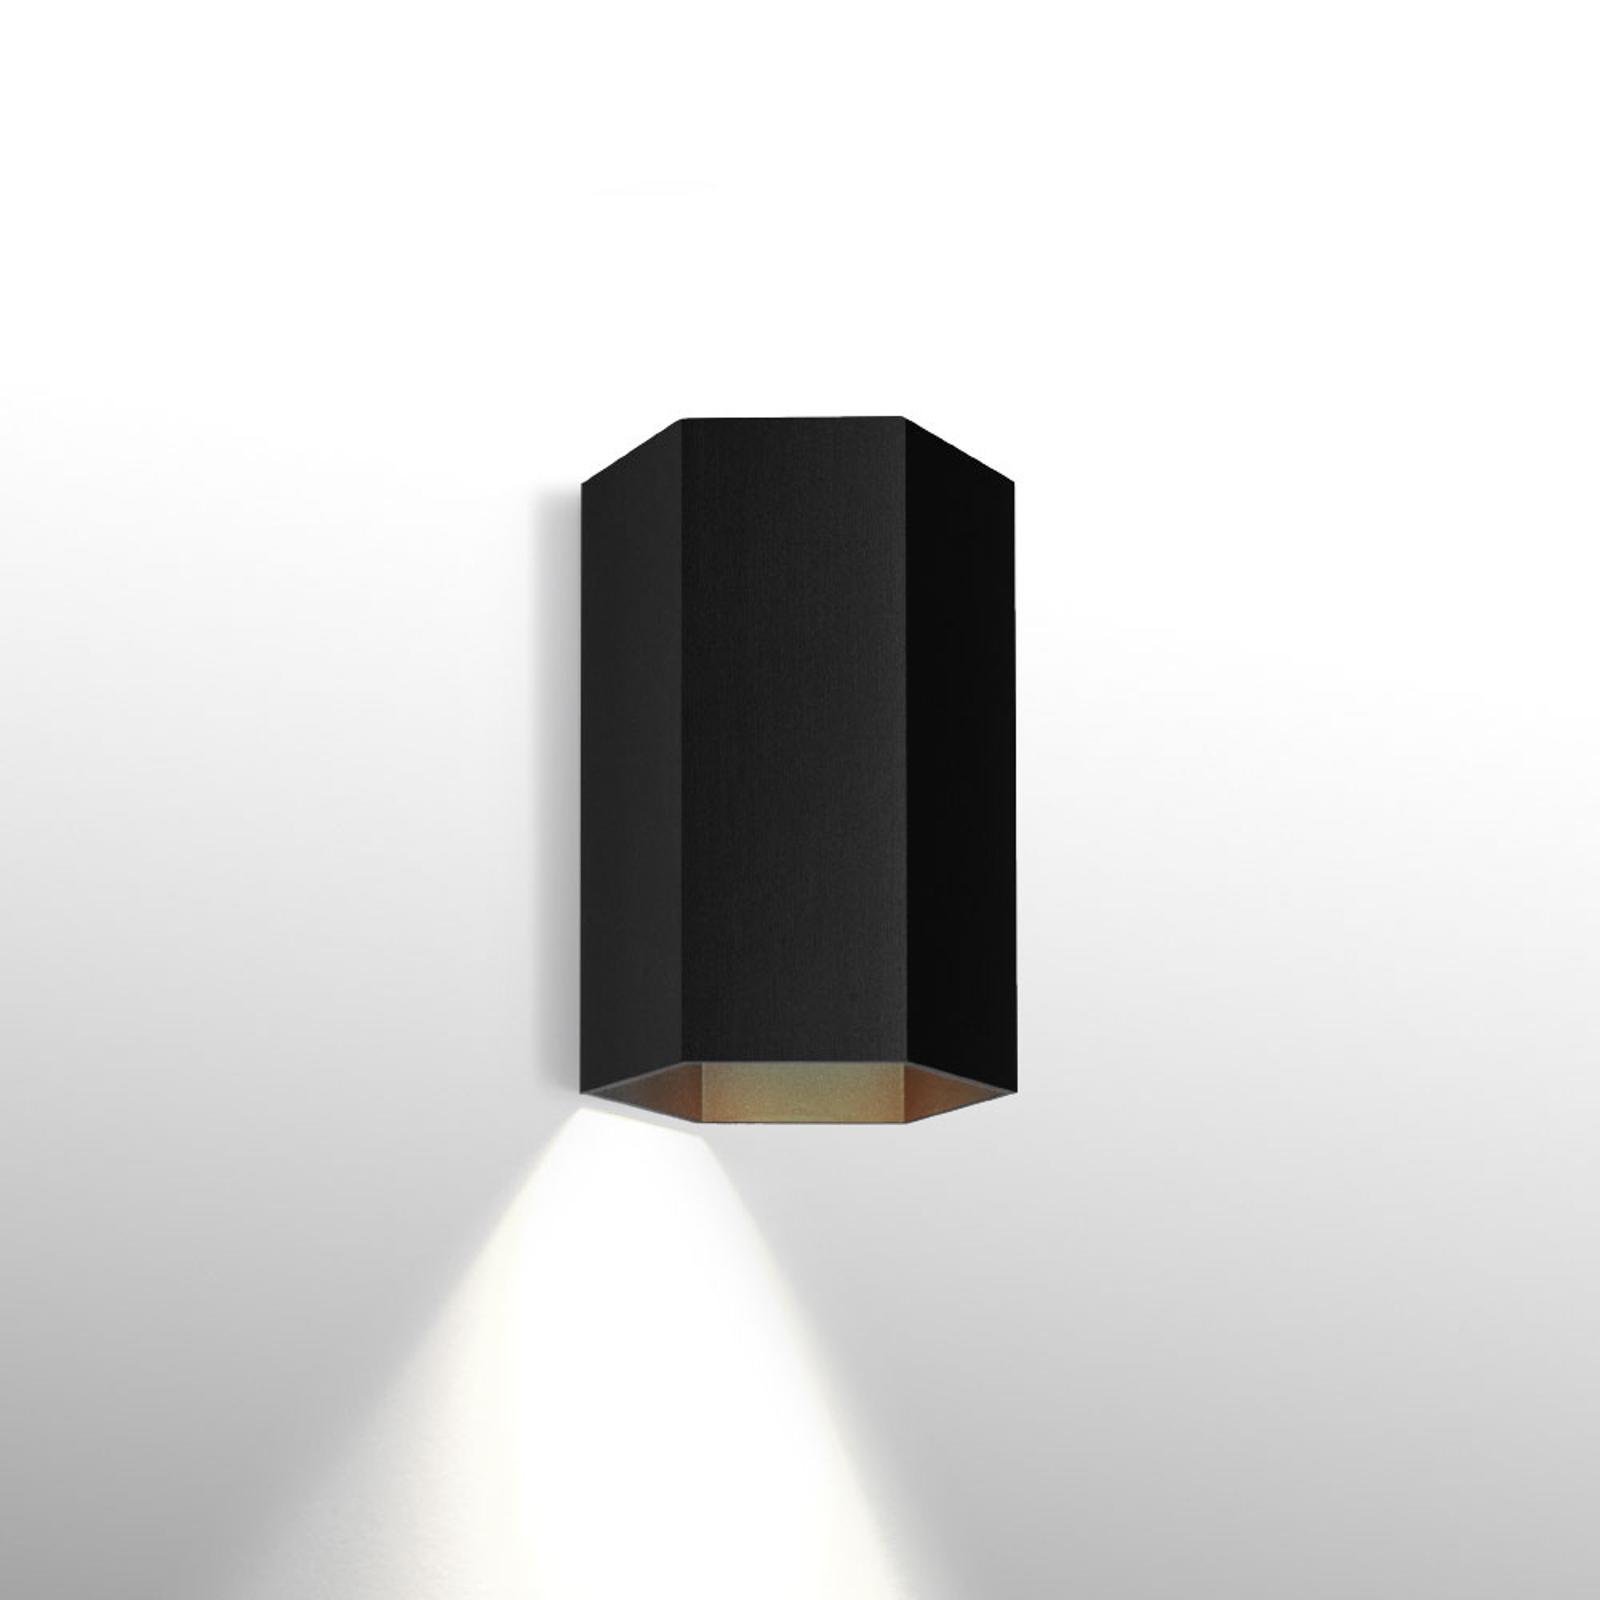 WEVER & DUCRÉ Hexo mini 1.0 wandlamp 11,5 zwart